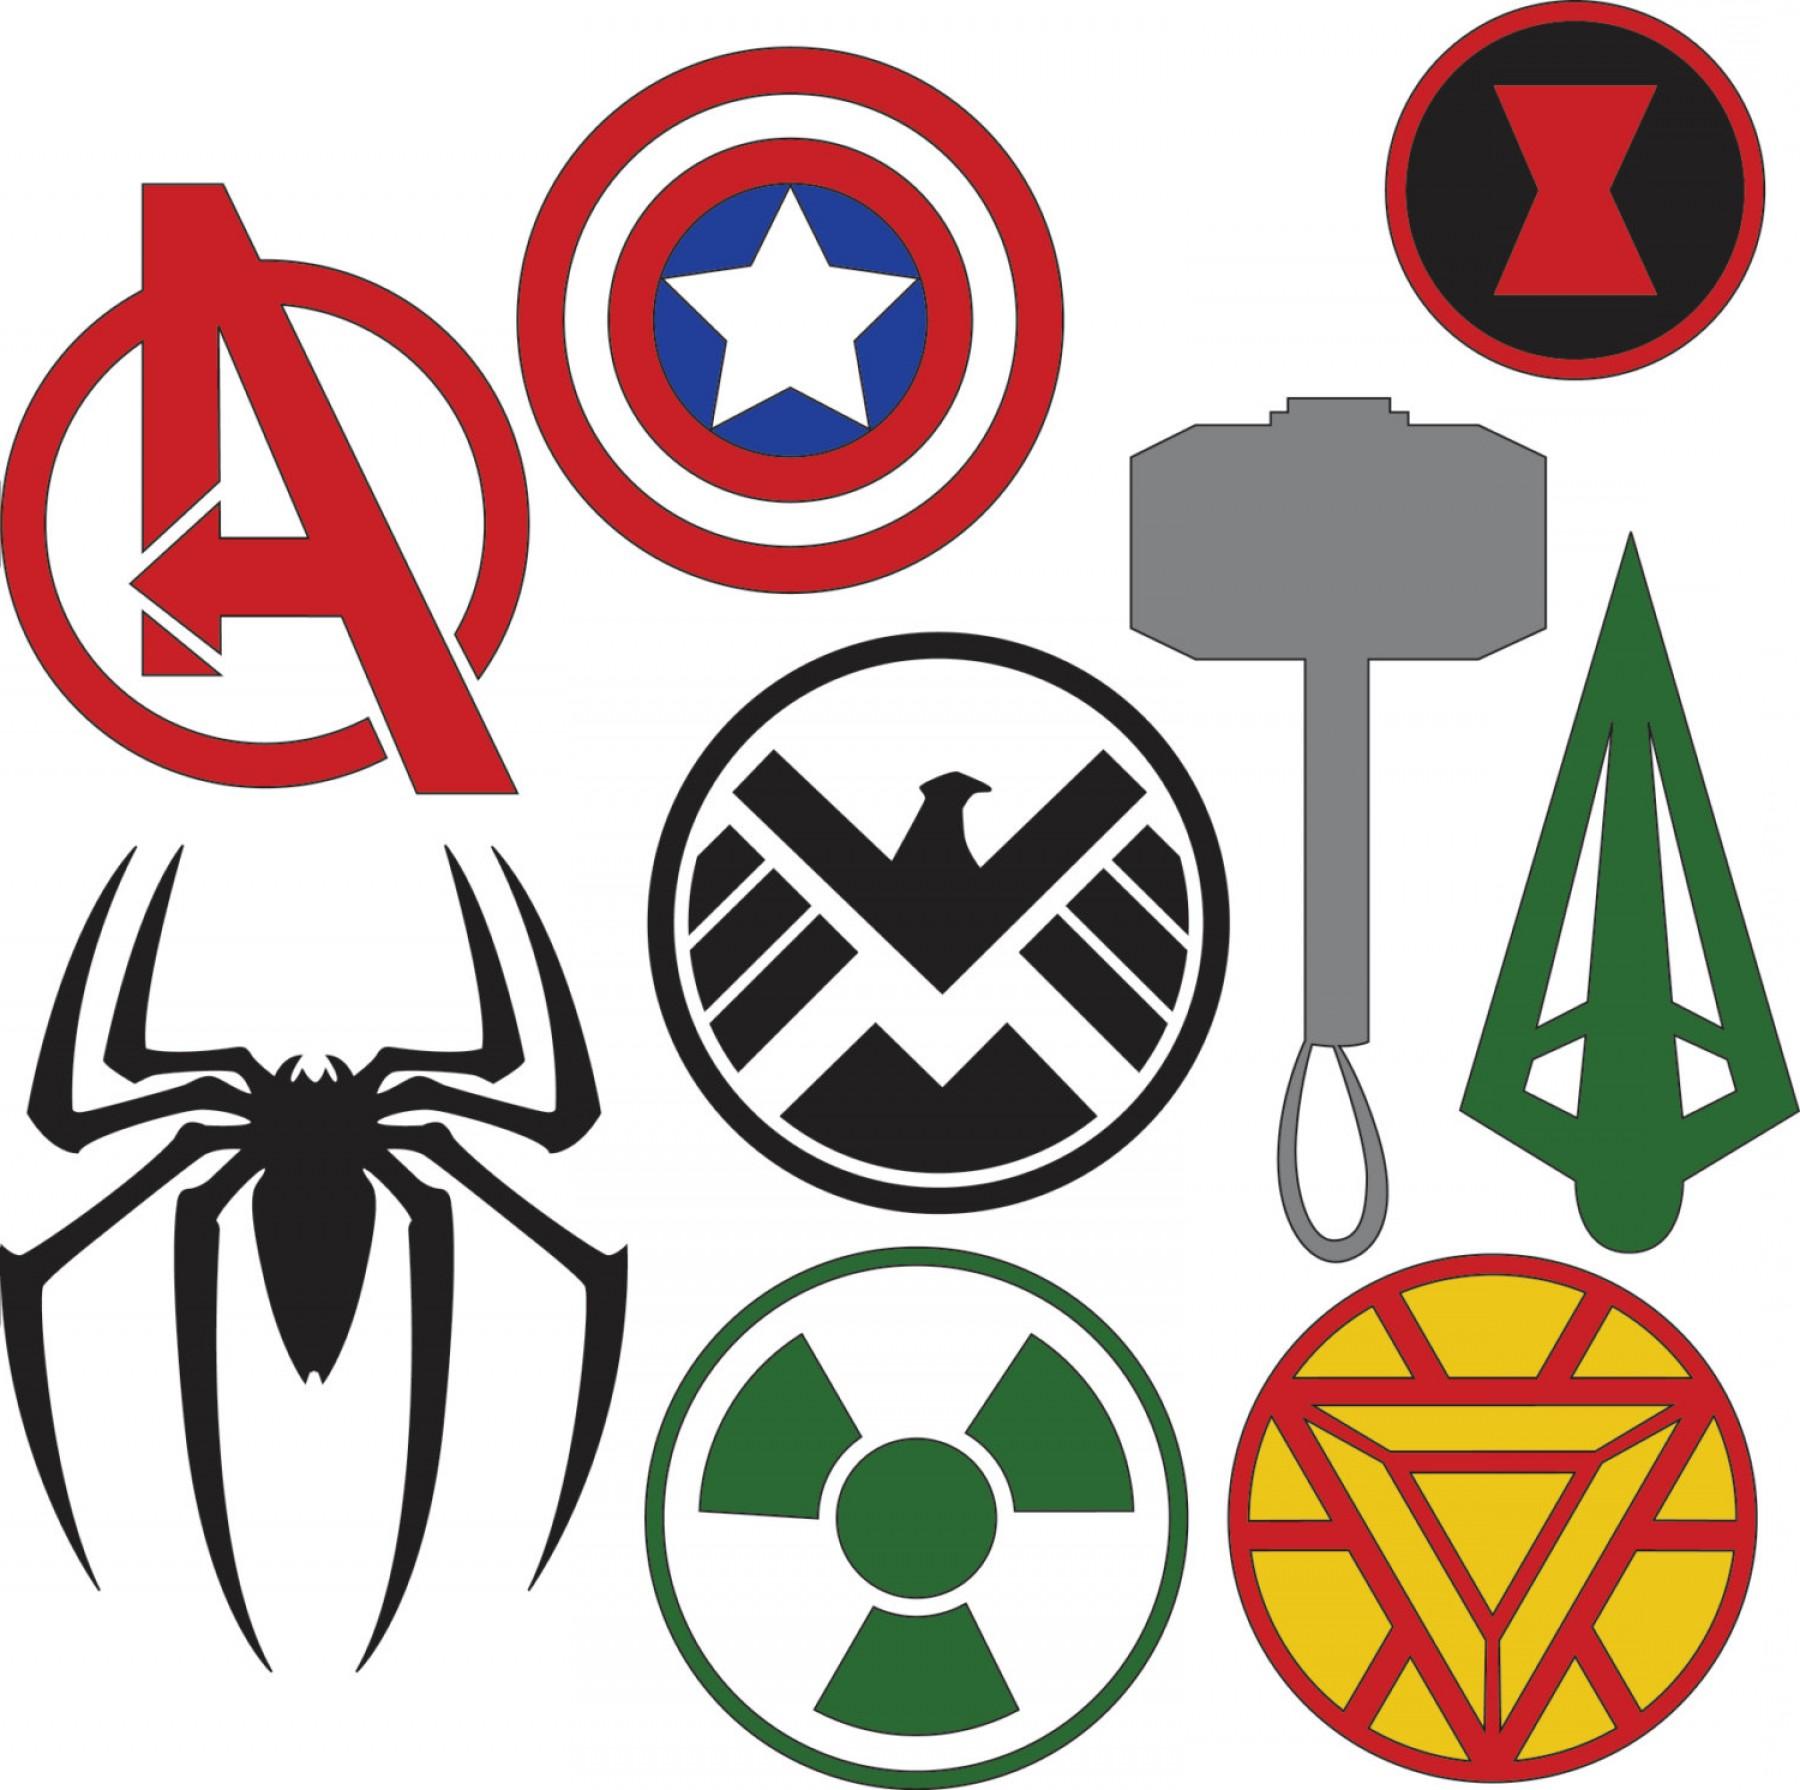 1800x1790 Marvel Superhero Logos Svg Dxf Files Shopatcloth